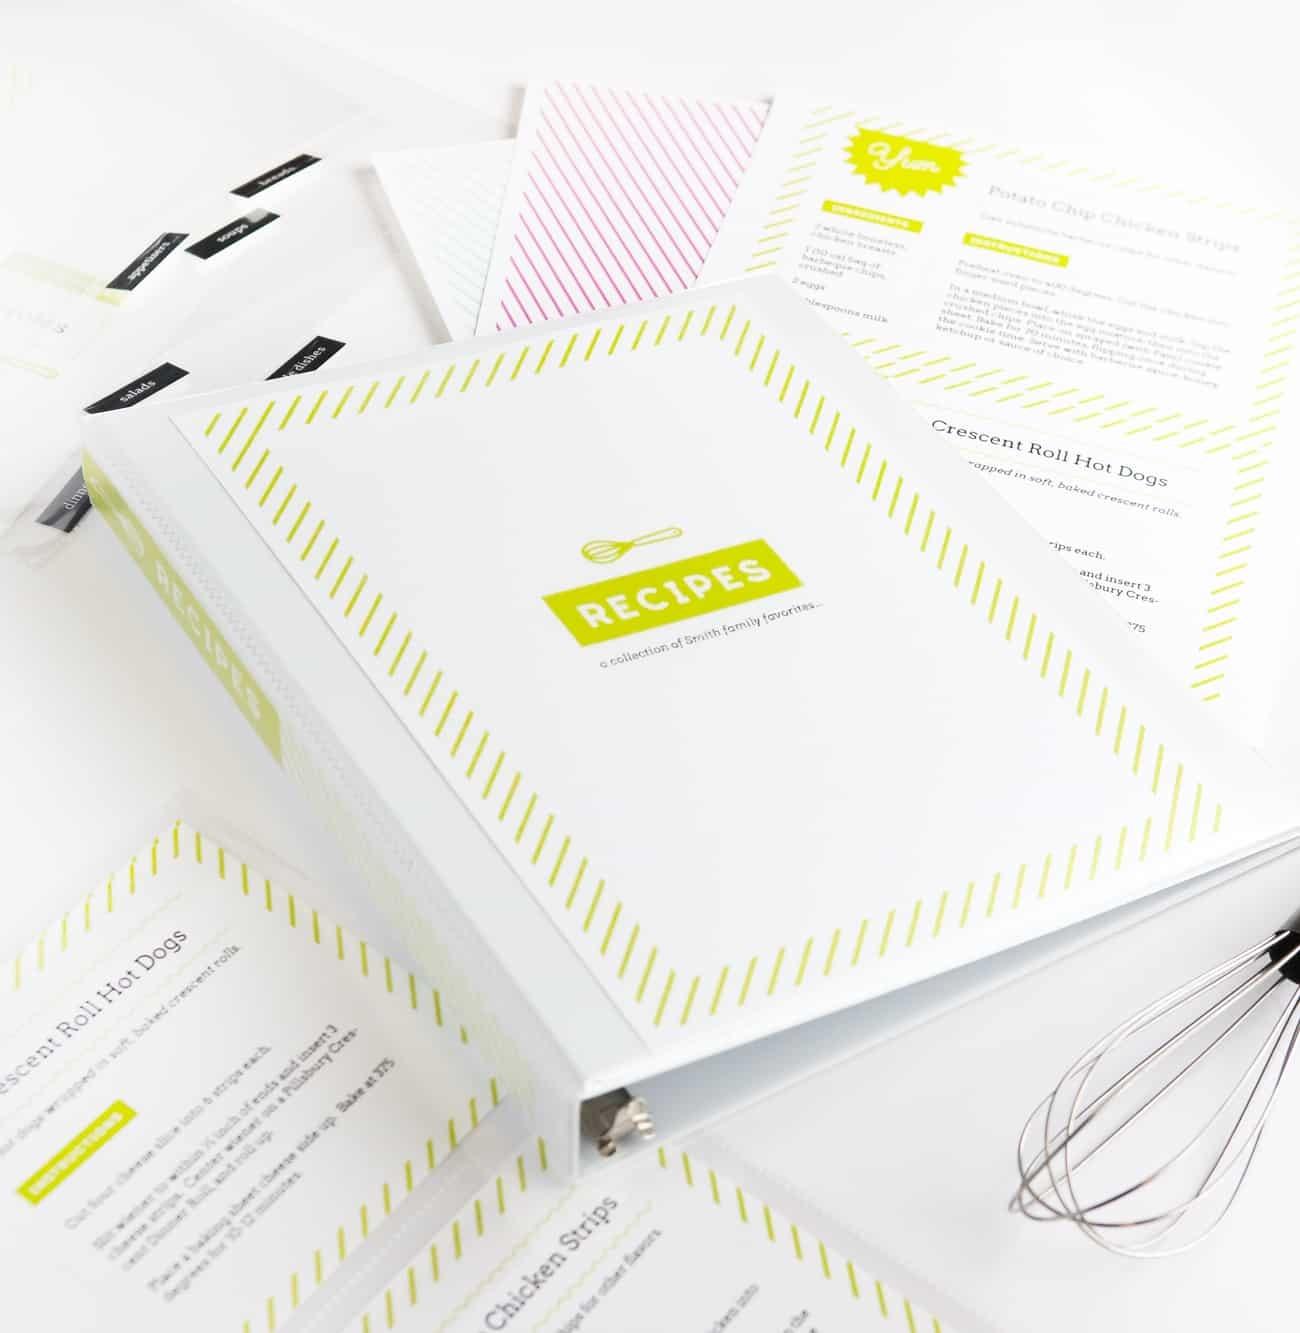 Diy Recipe Book (With Free Printable Recipe Binder Kit!) - Free Printable Recipe Binder Kit